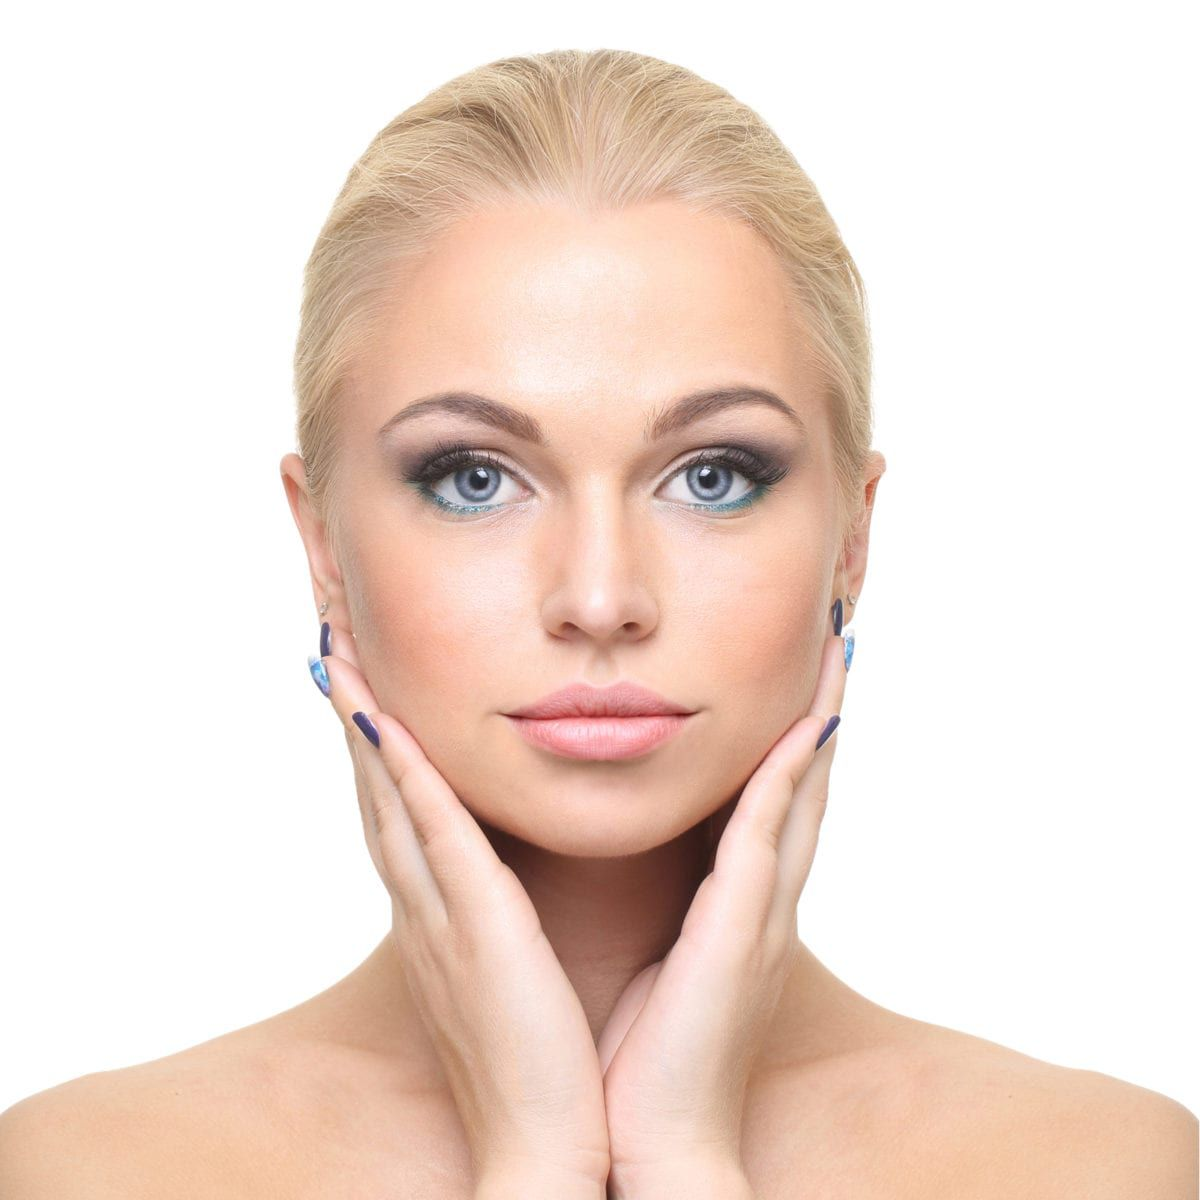 caucasian model holding face